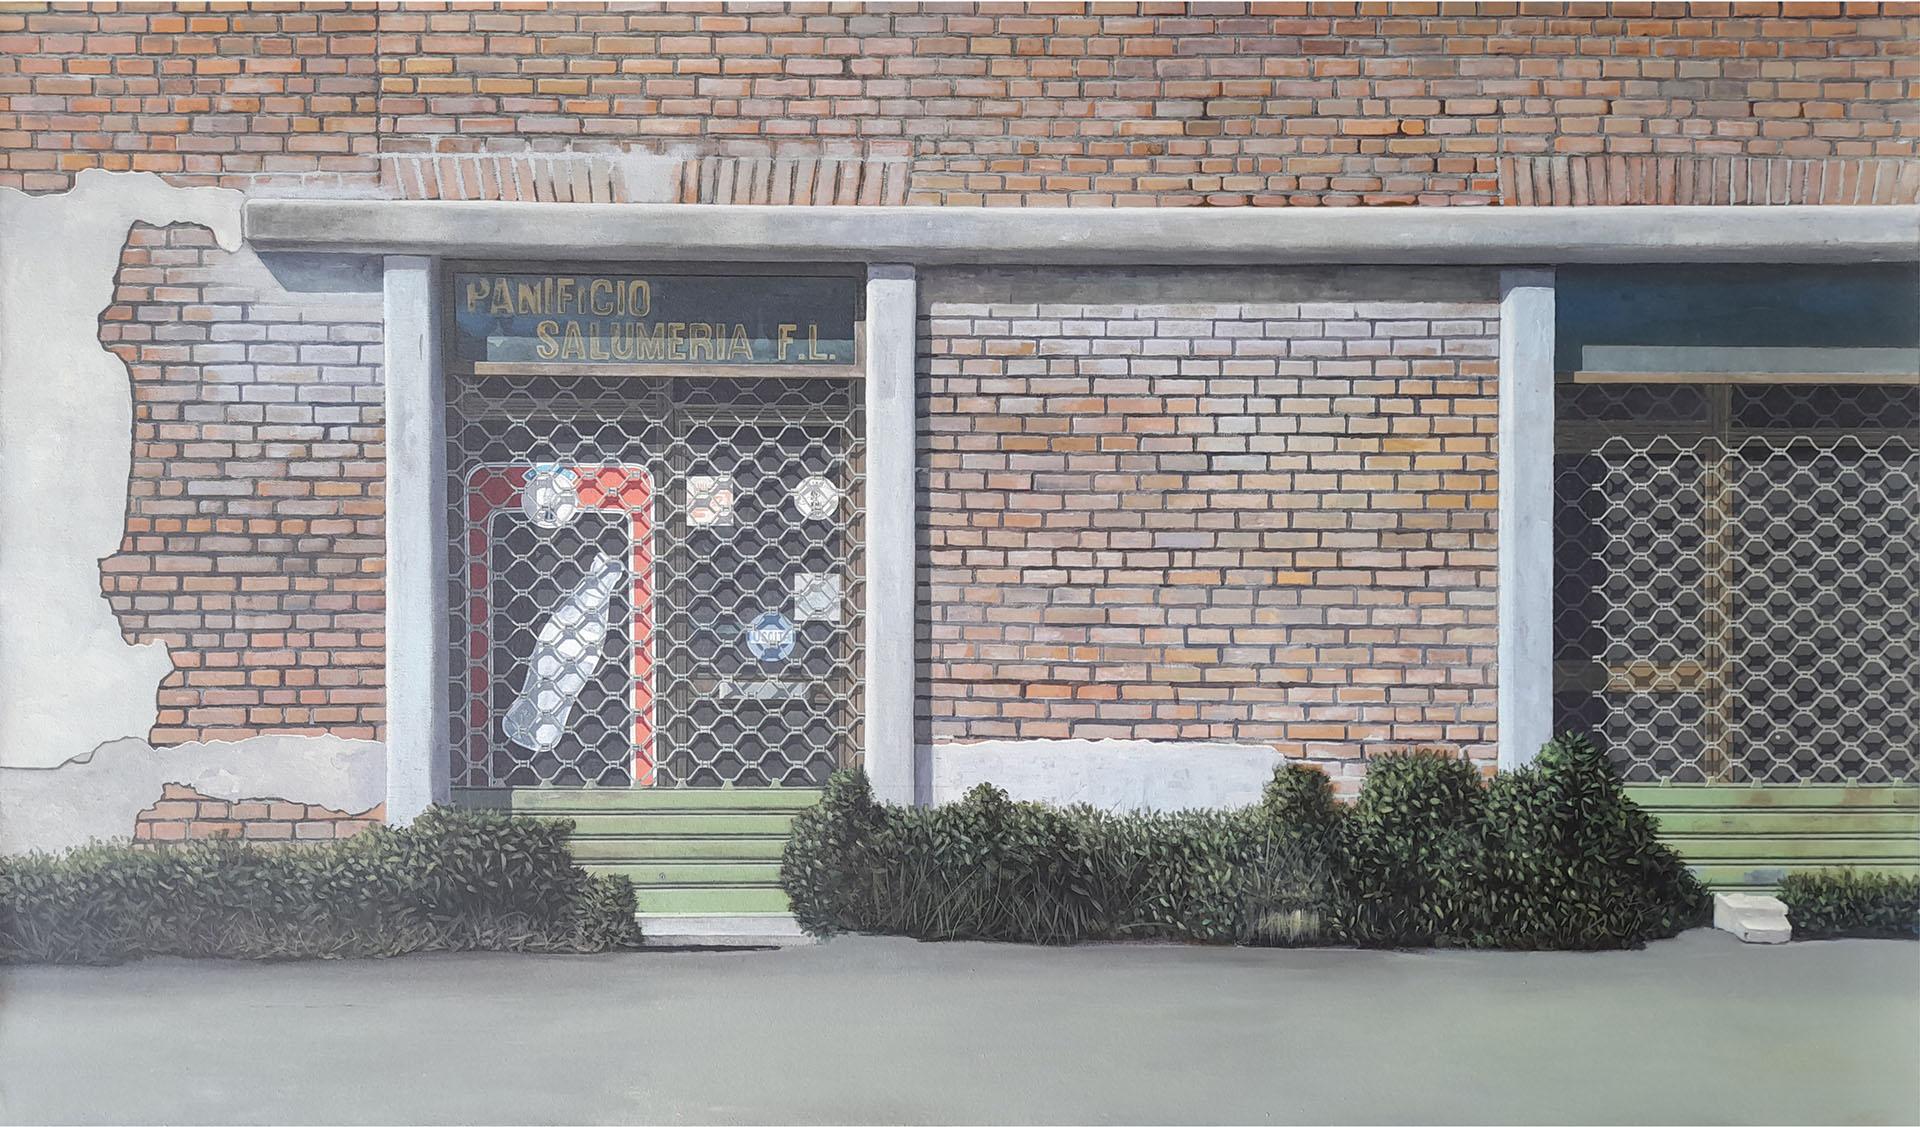 Guido Pigni 2017, acrylic on canvas, cm 60x90